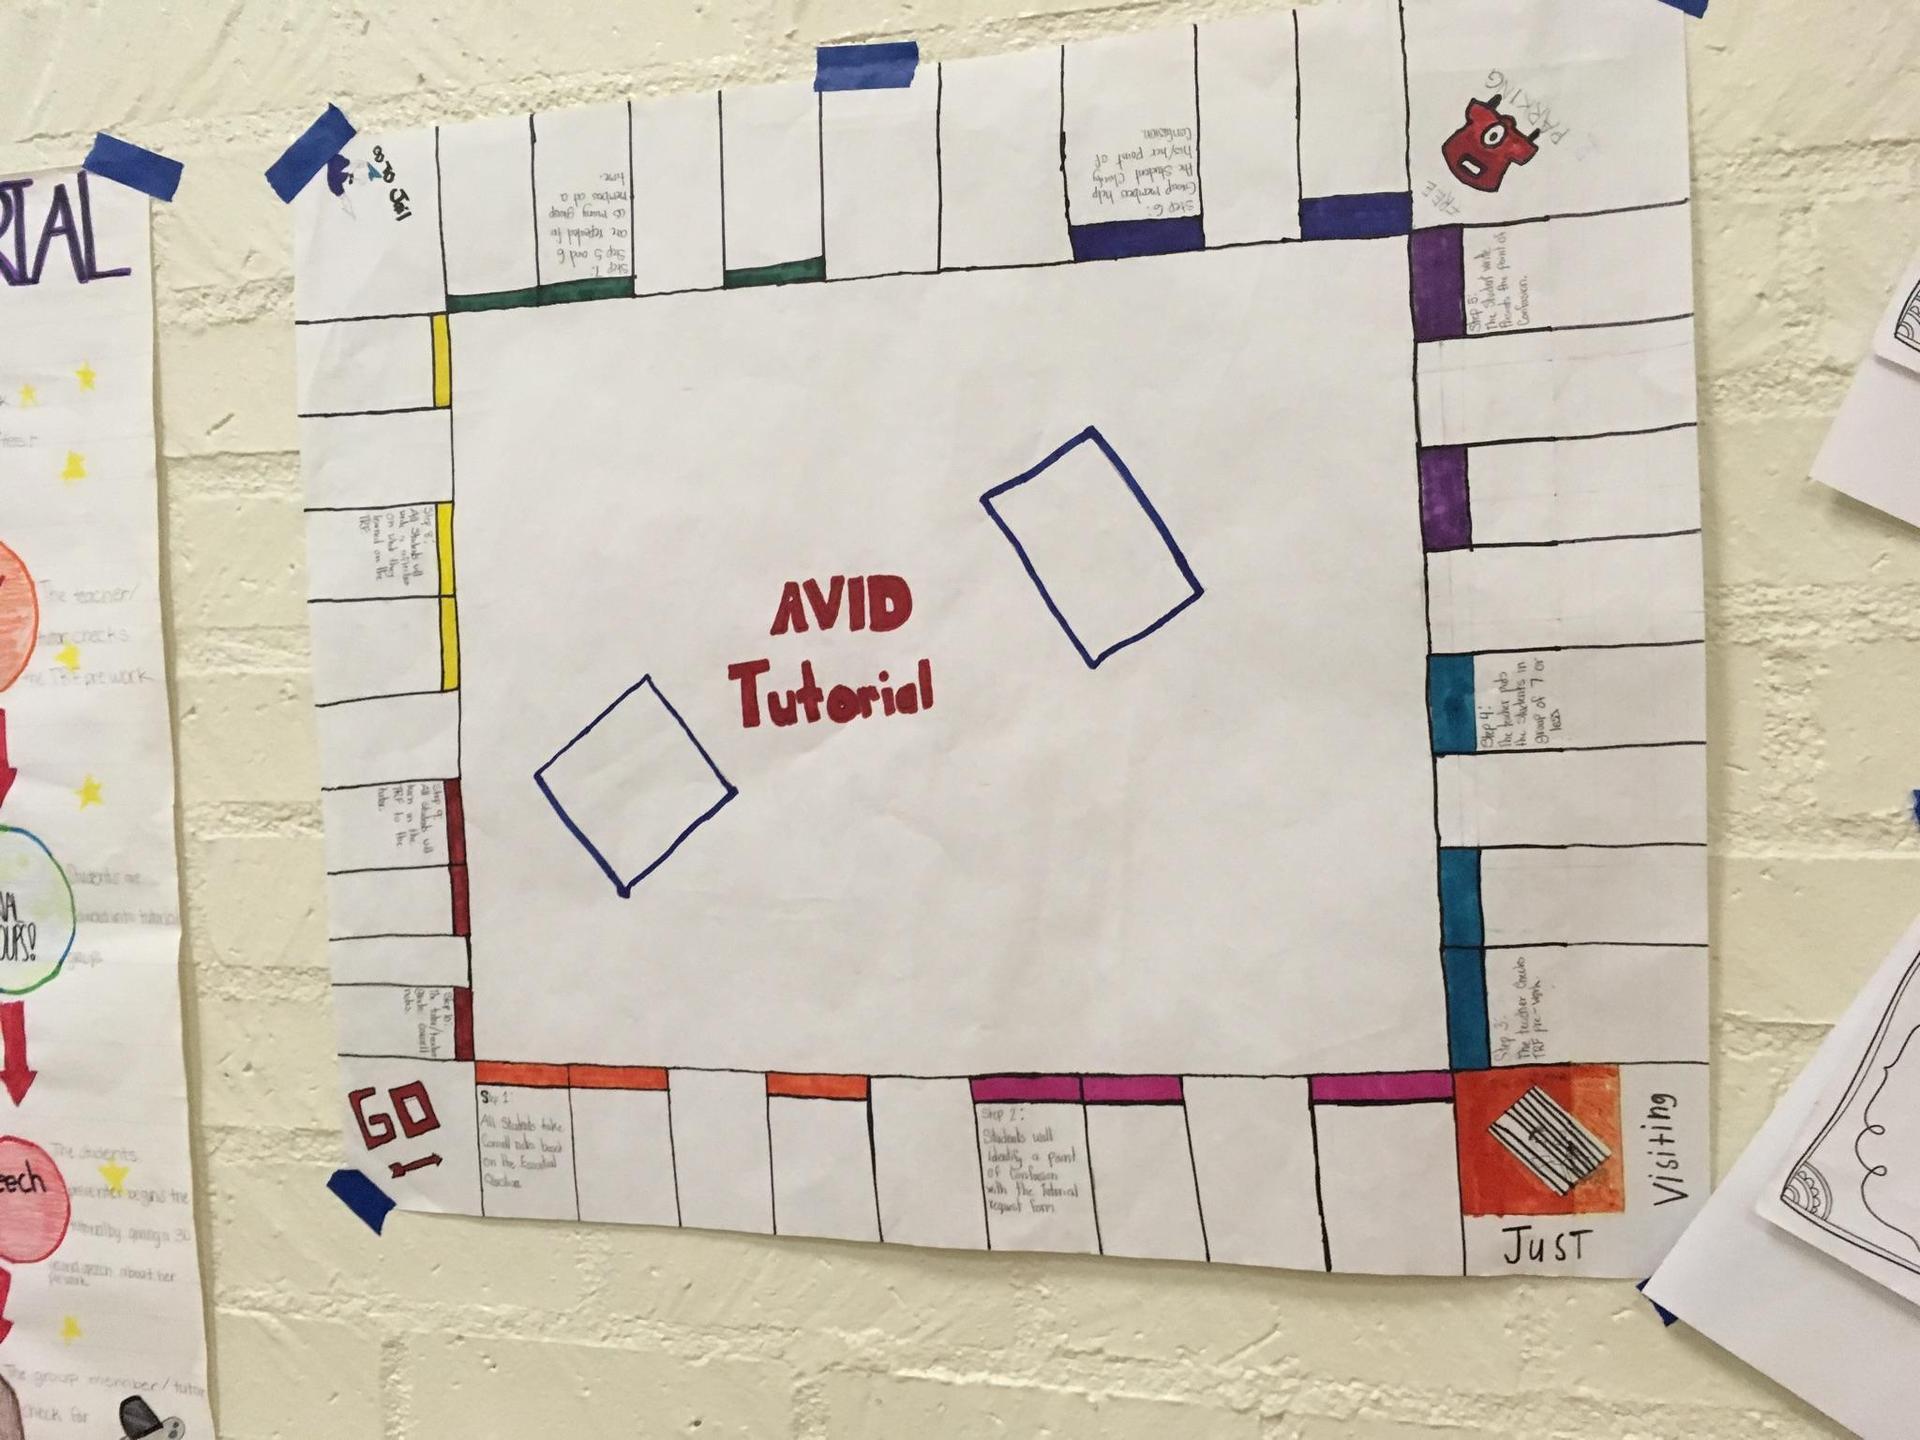 Map of AVID Tutorial space